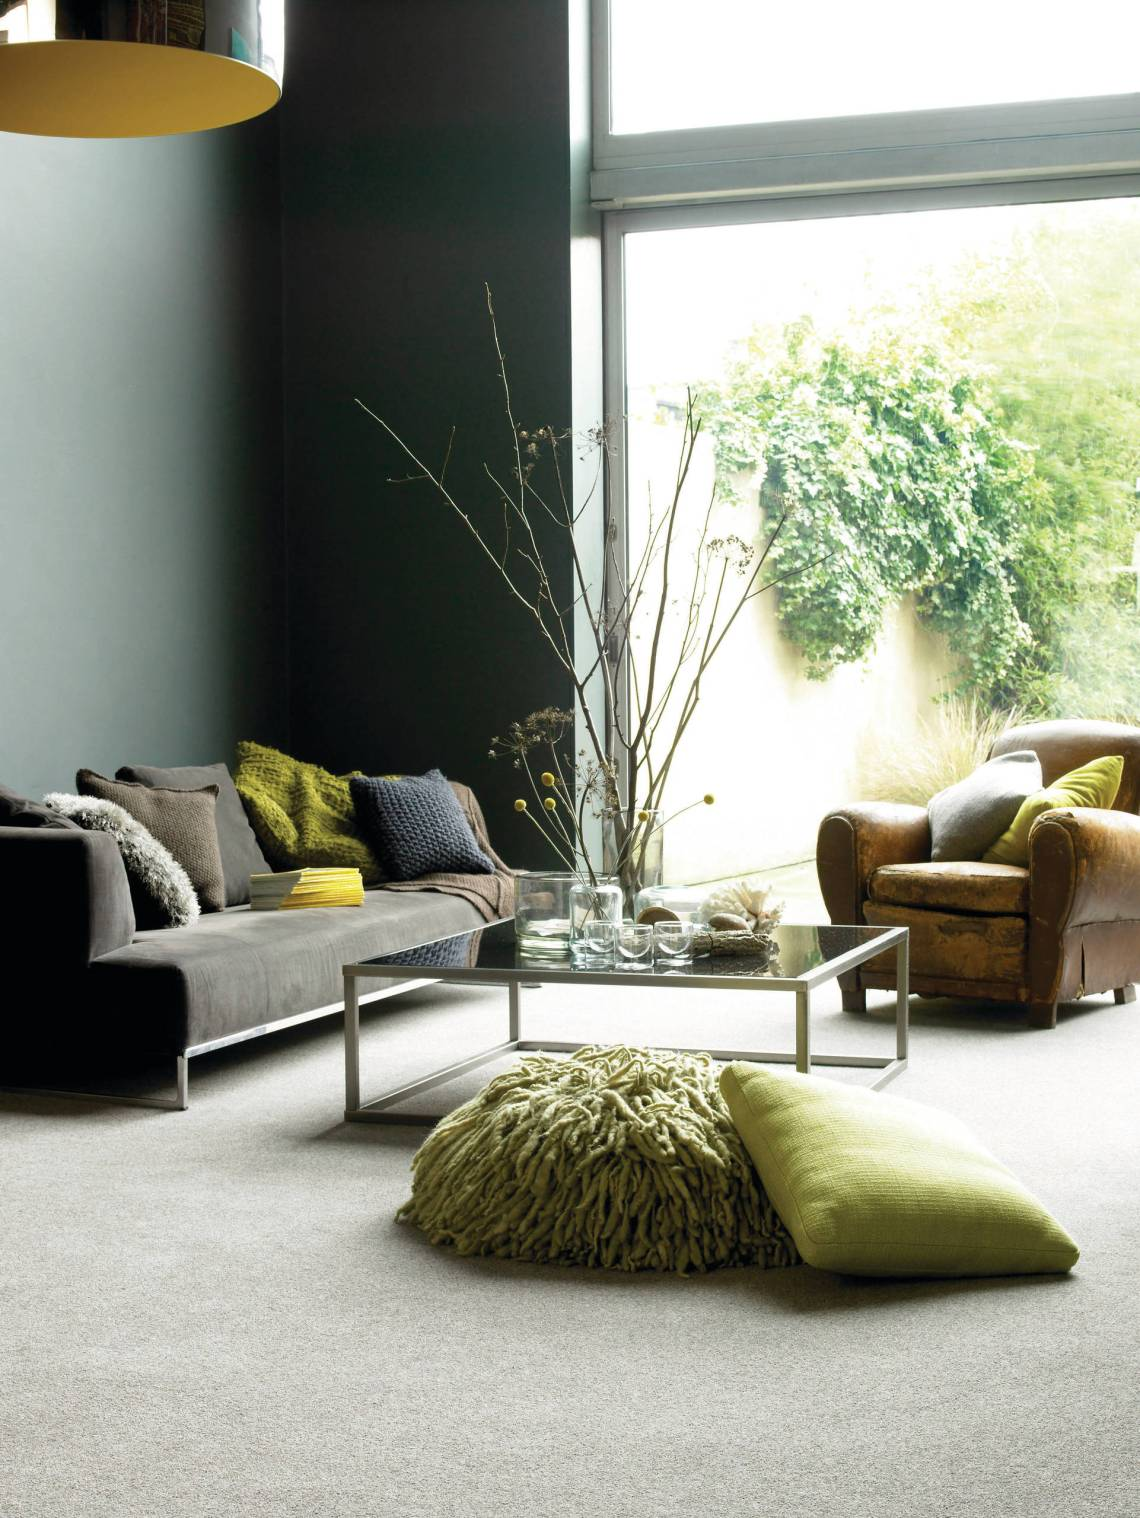 Cream And Olive Green Colour Scheme Living Room Ideas Photos Houzz